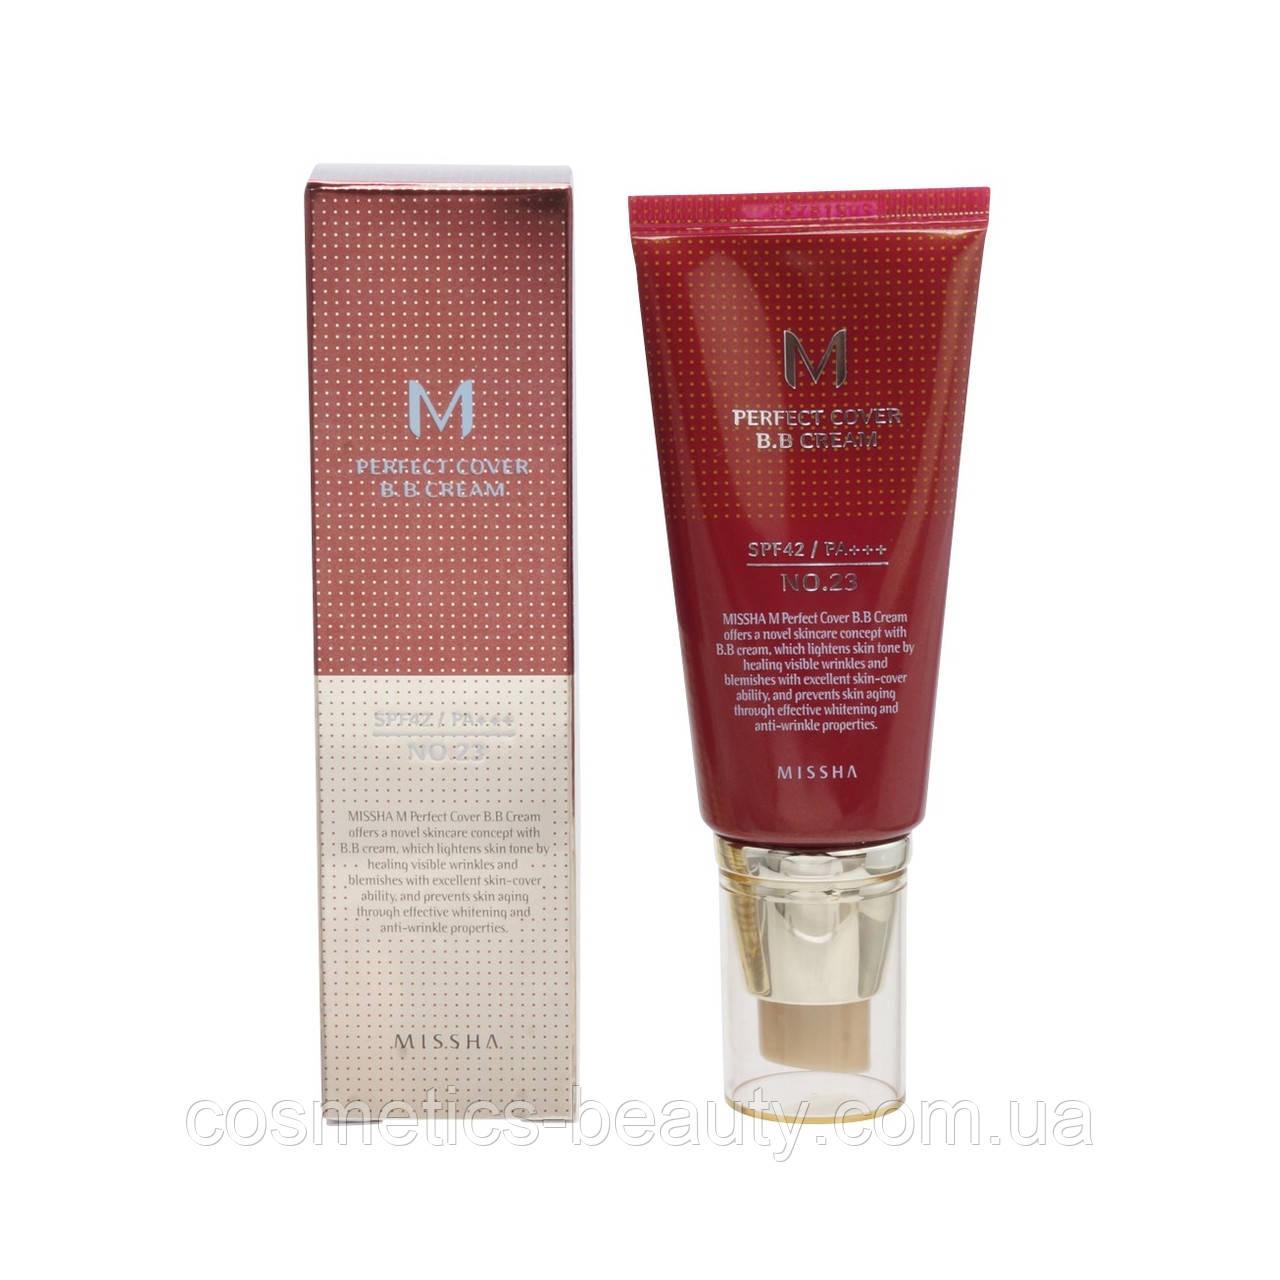 Missha M Perfect Cover BB Cream BB крем SPF42 / PA+++  №21,50 мл.